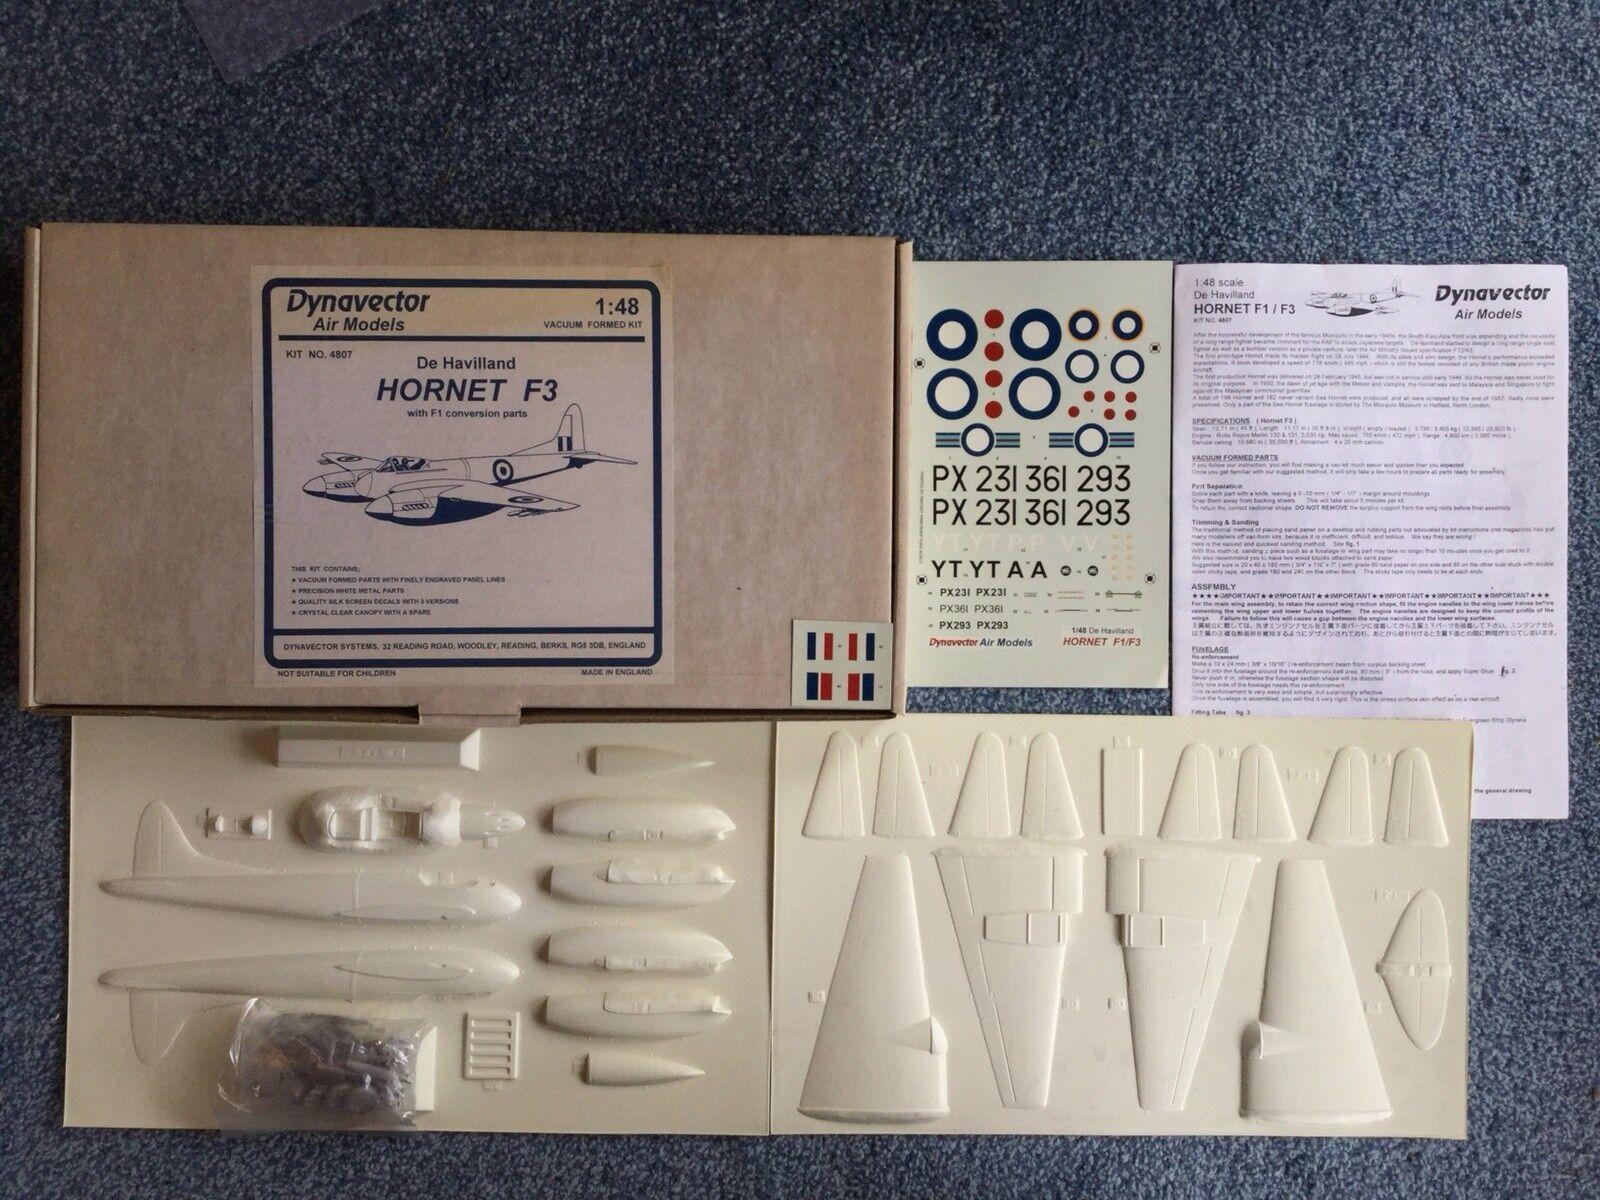 Dynavector 1 48 4807 Dh Hornet F3 (Vacuform & Metal Kit)